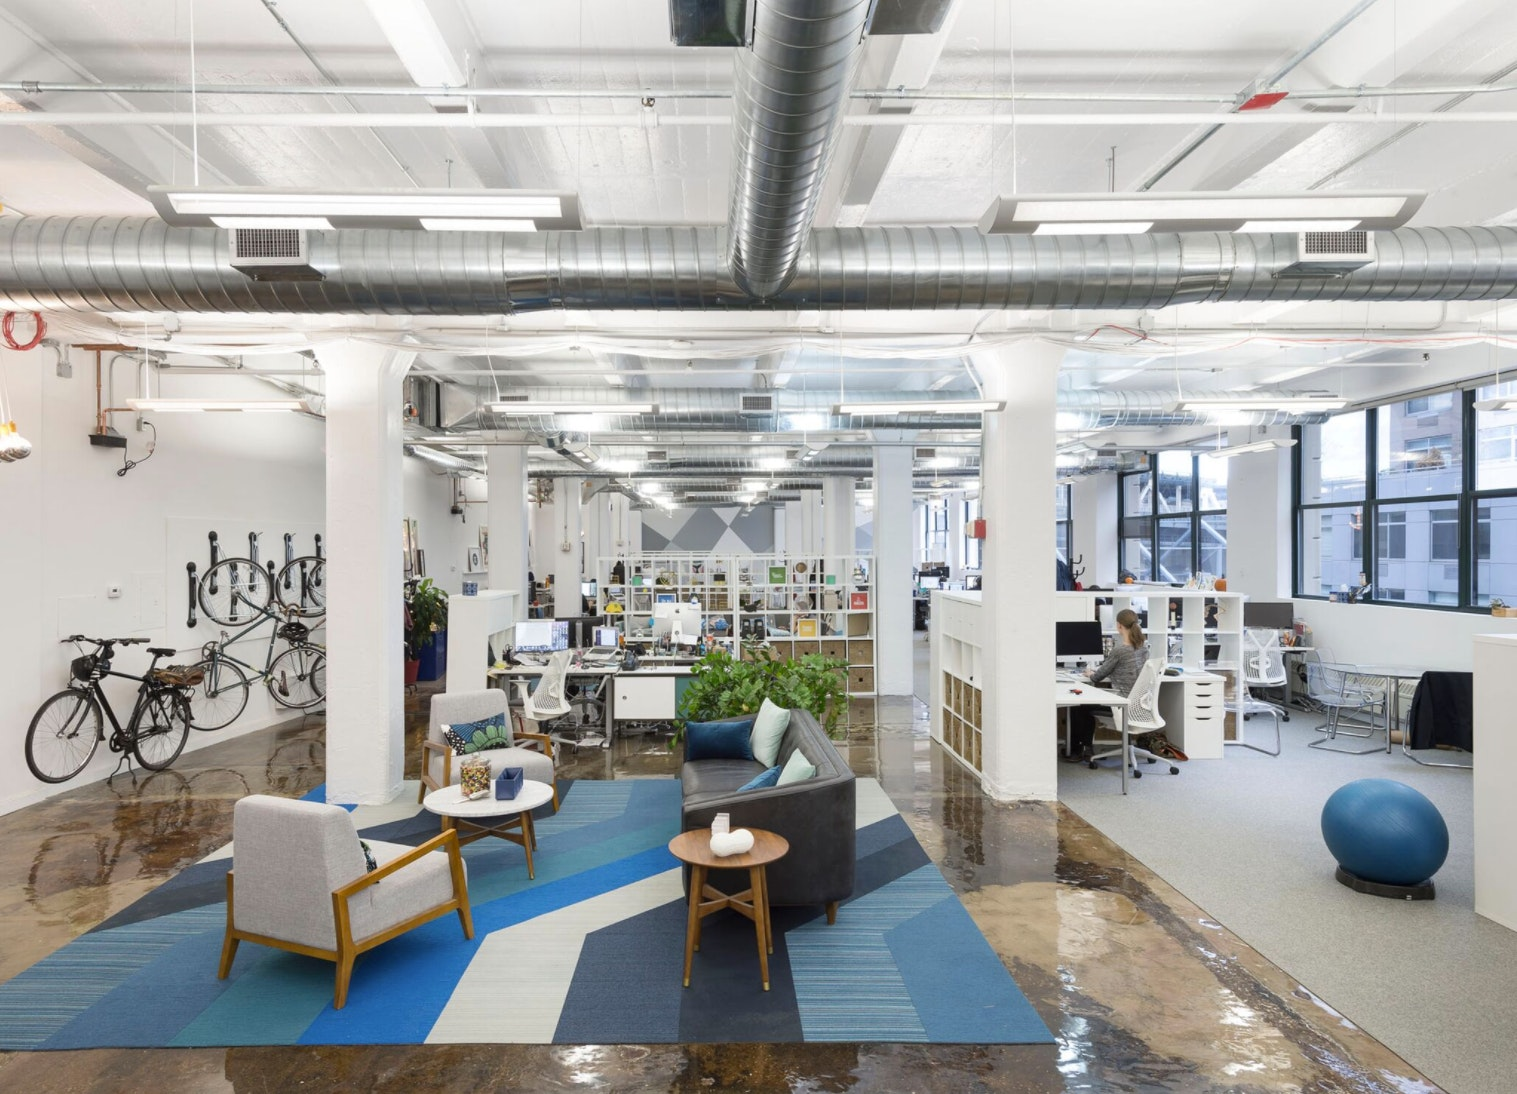 Flocabulary's office in 55 Washington